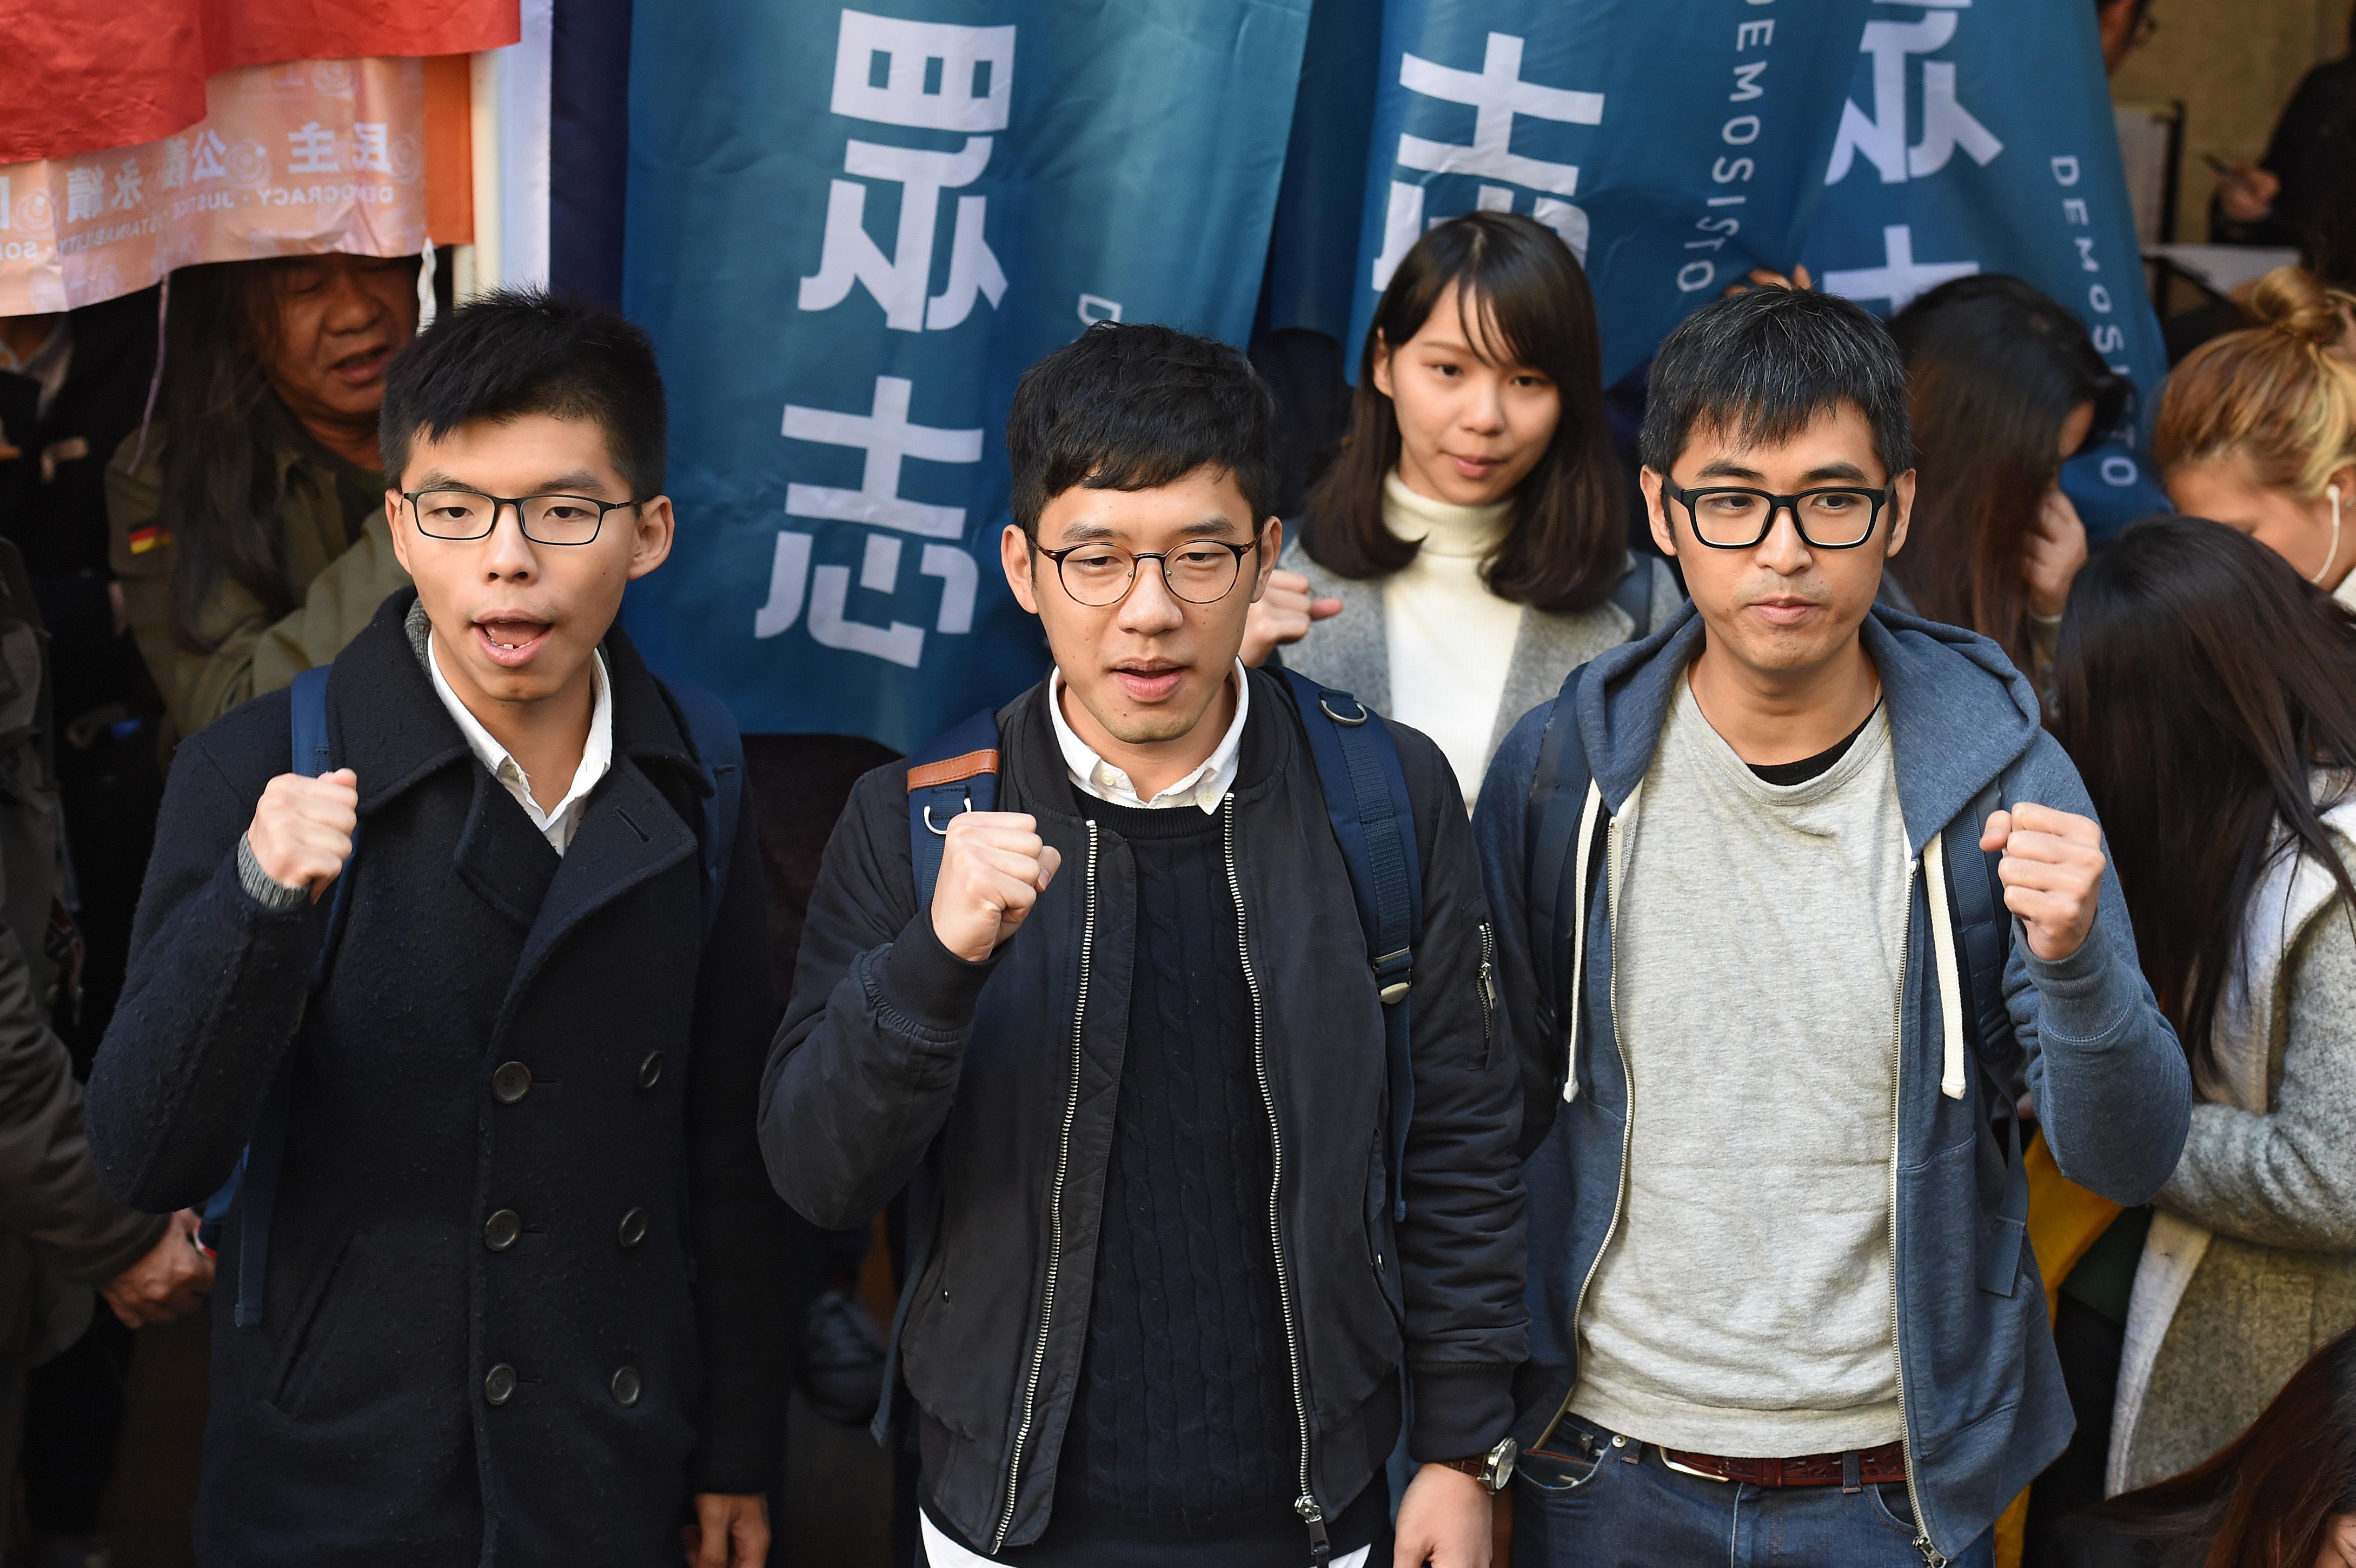 Hong Kong democracy activists Joshua Wong, Nathan Law and Alex Chow outside Hong Kong's Court of Final Appeal before a hearing on Jan. 16, 2018.